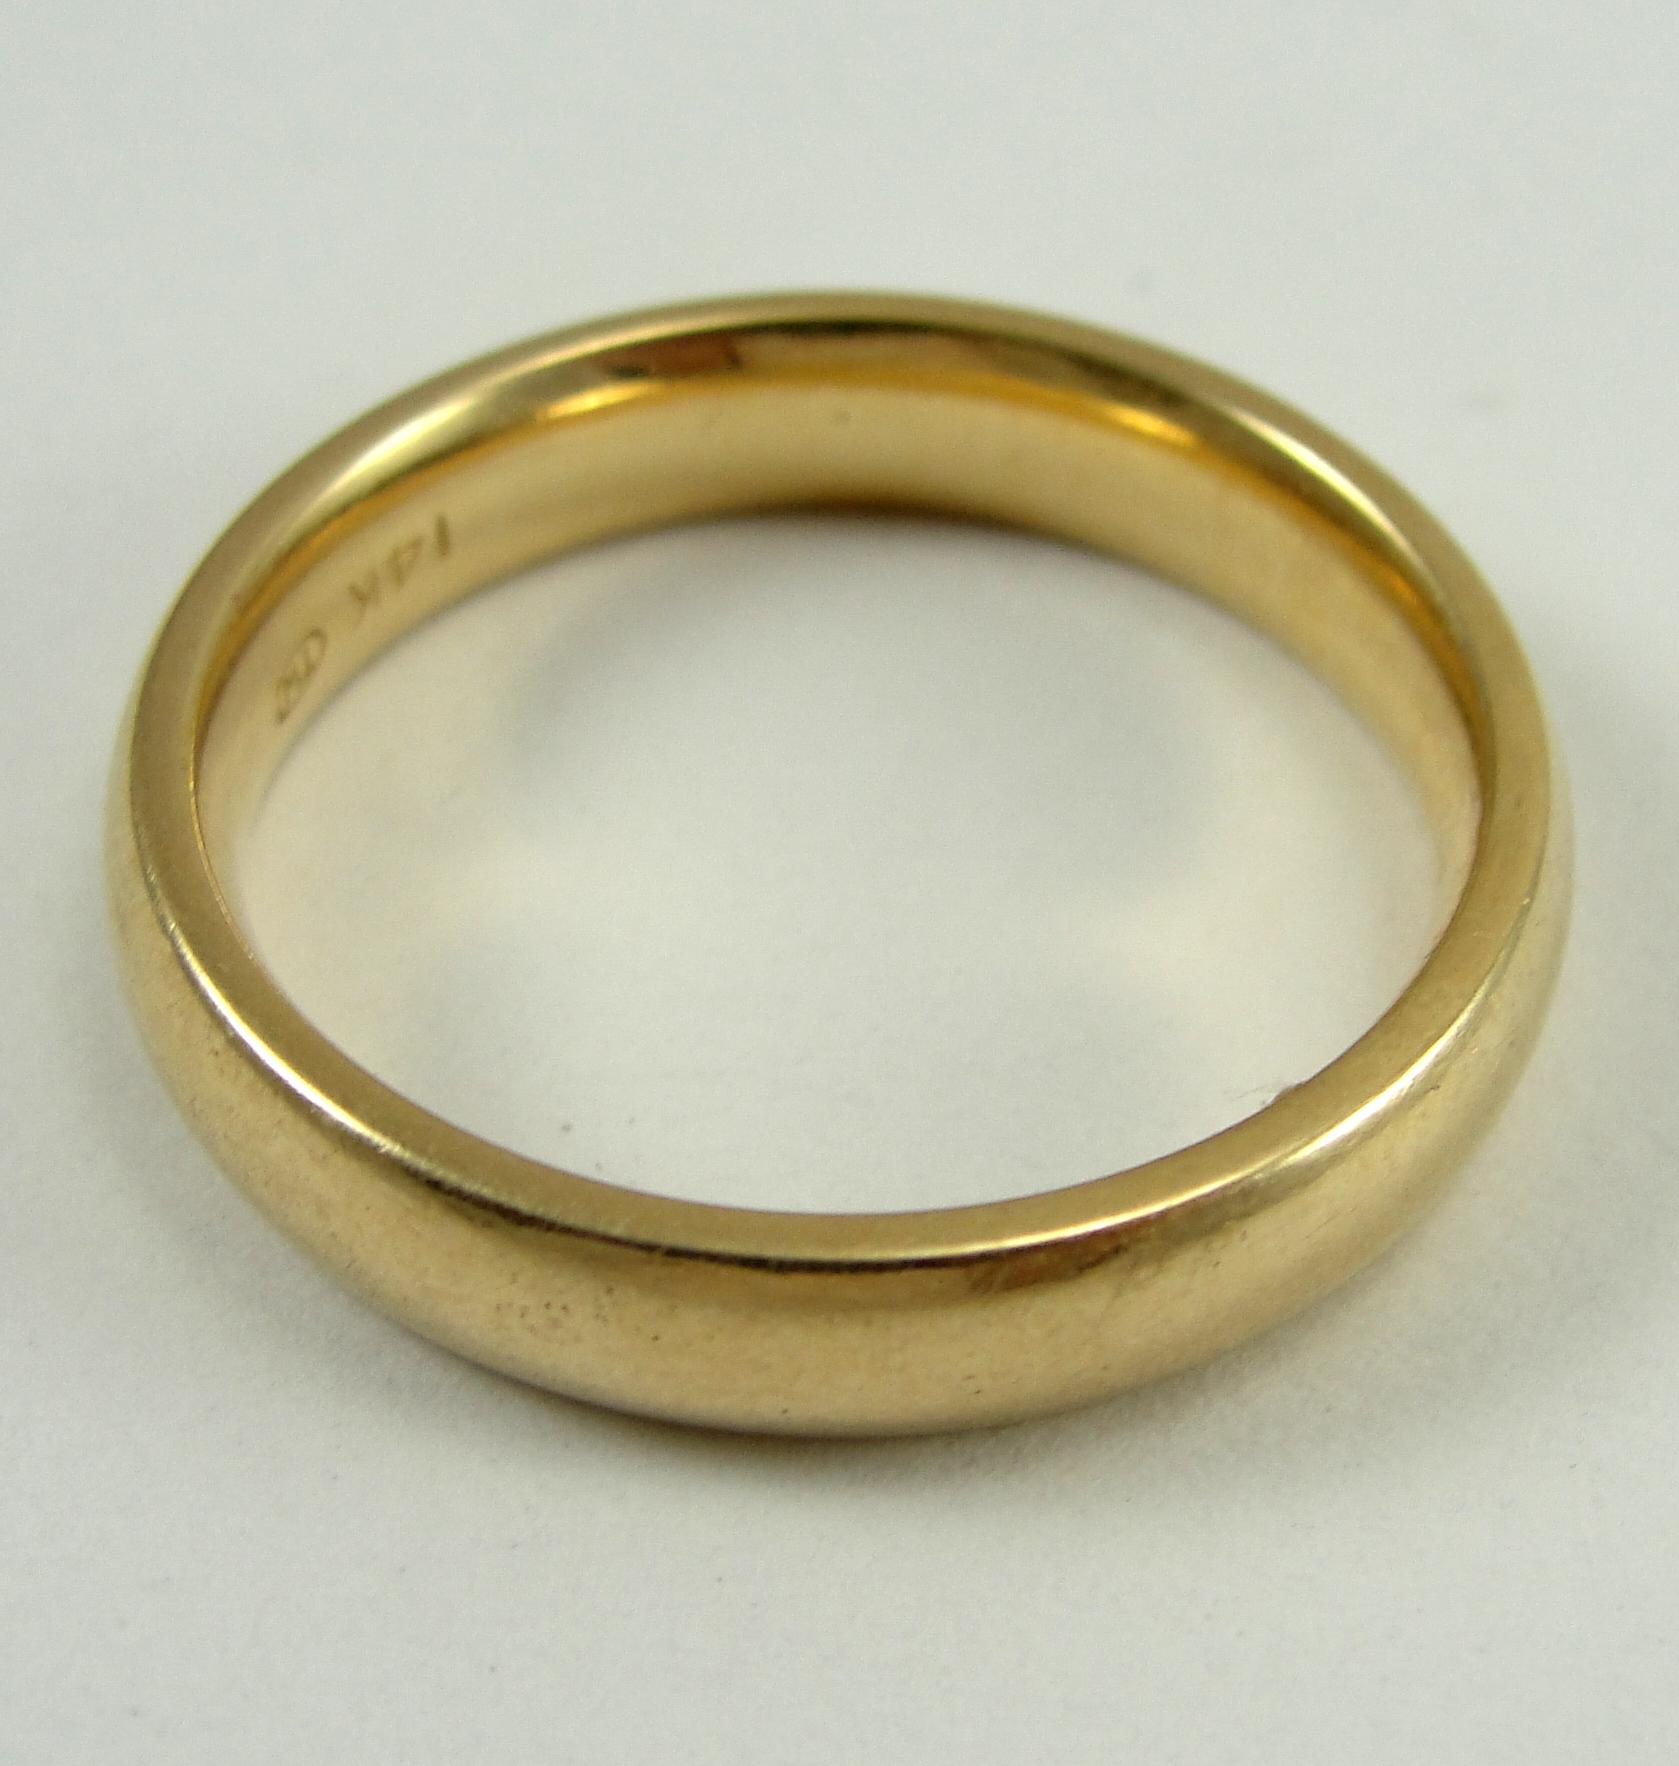 Image - 1315588494 14K-Yellow-Gold-Ring-Band-Wedding-4.15mm-Width ...